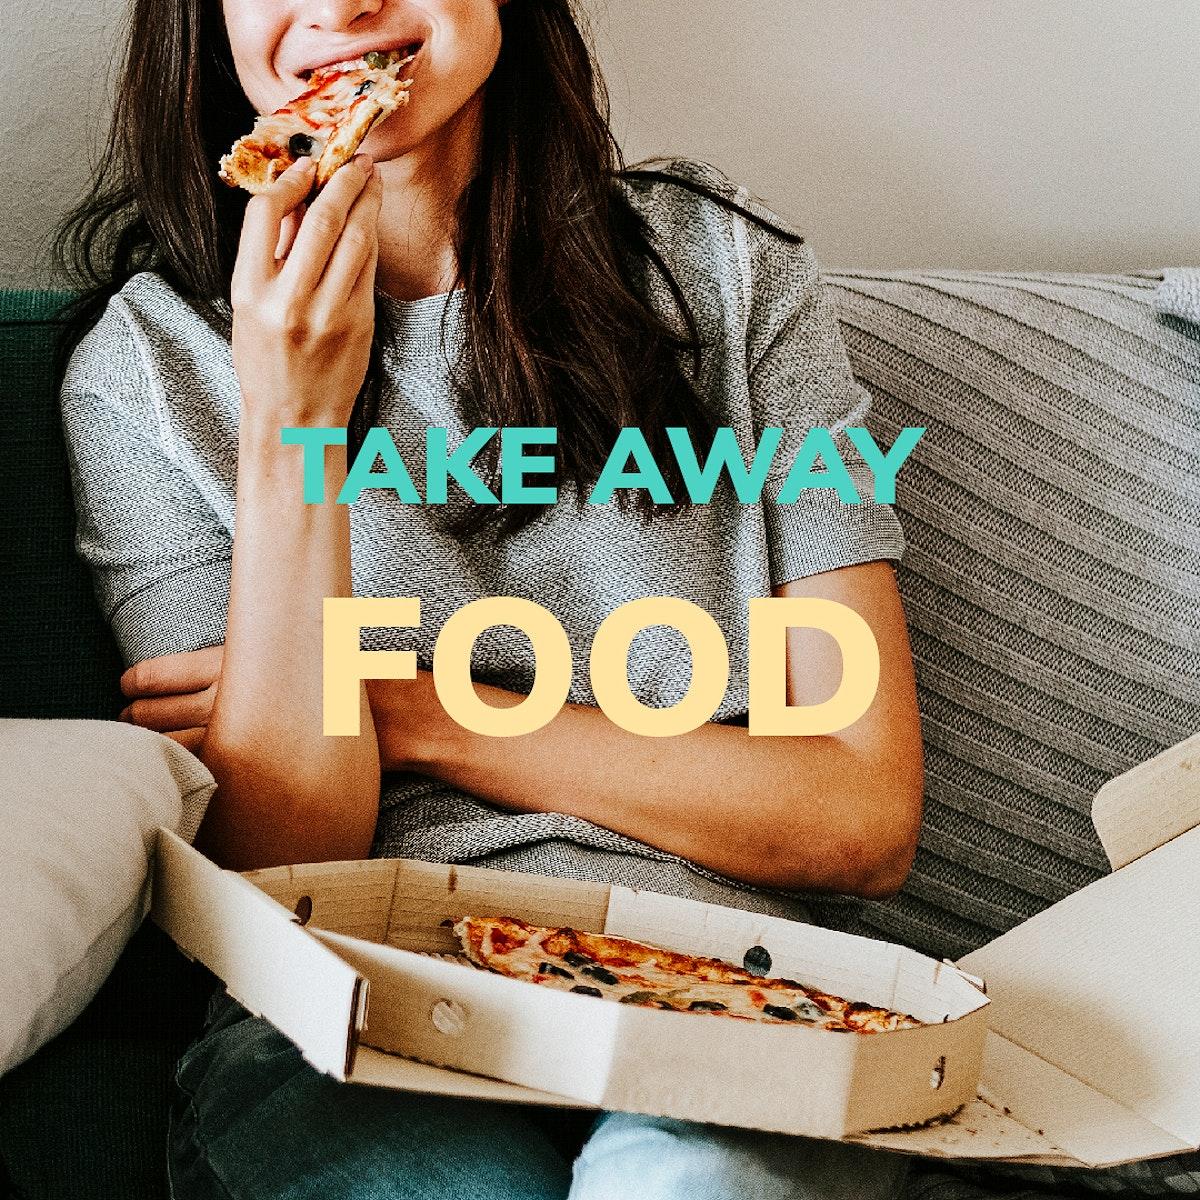 Woman eating takeaway pizza during coronavirus quarantine mockup